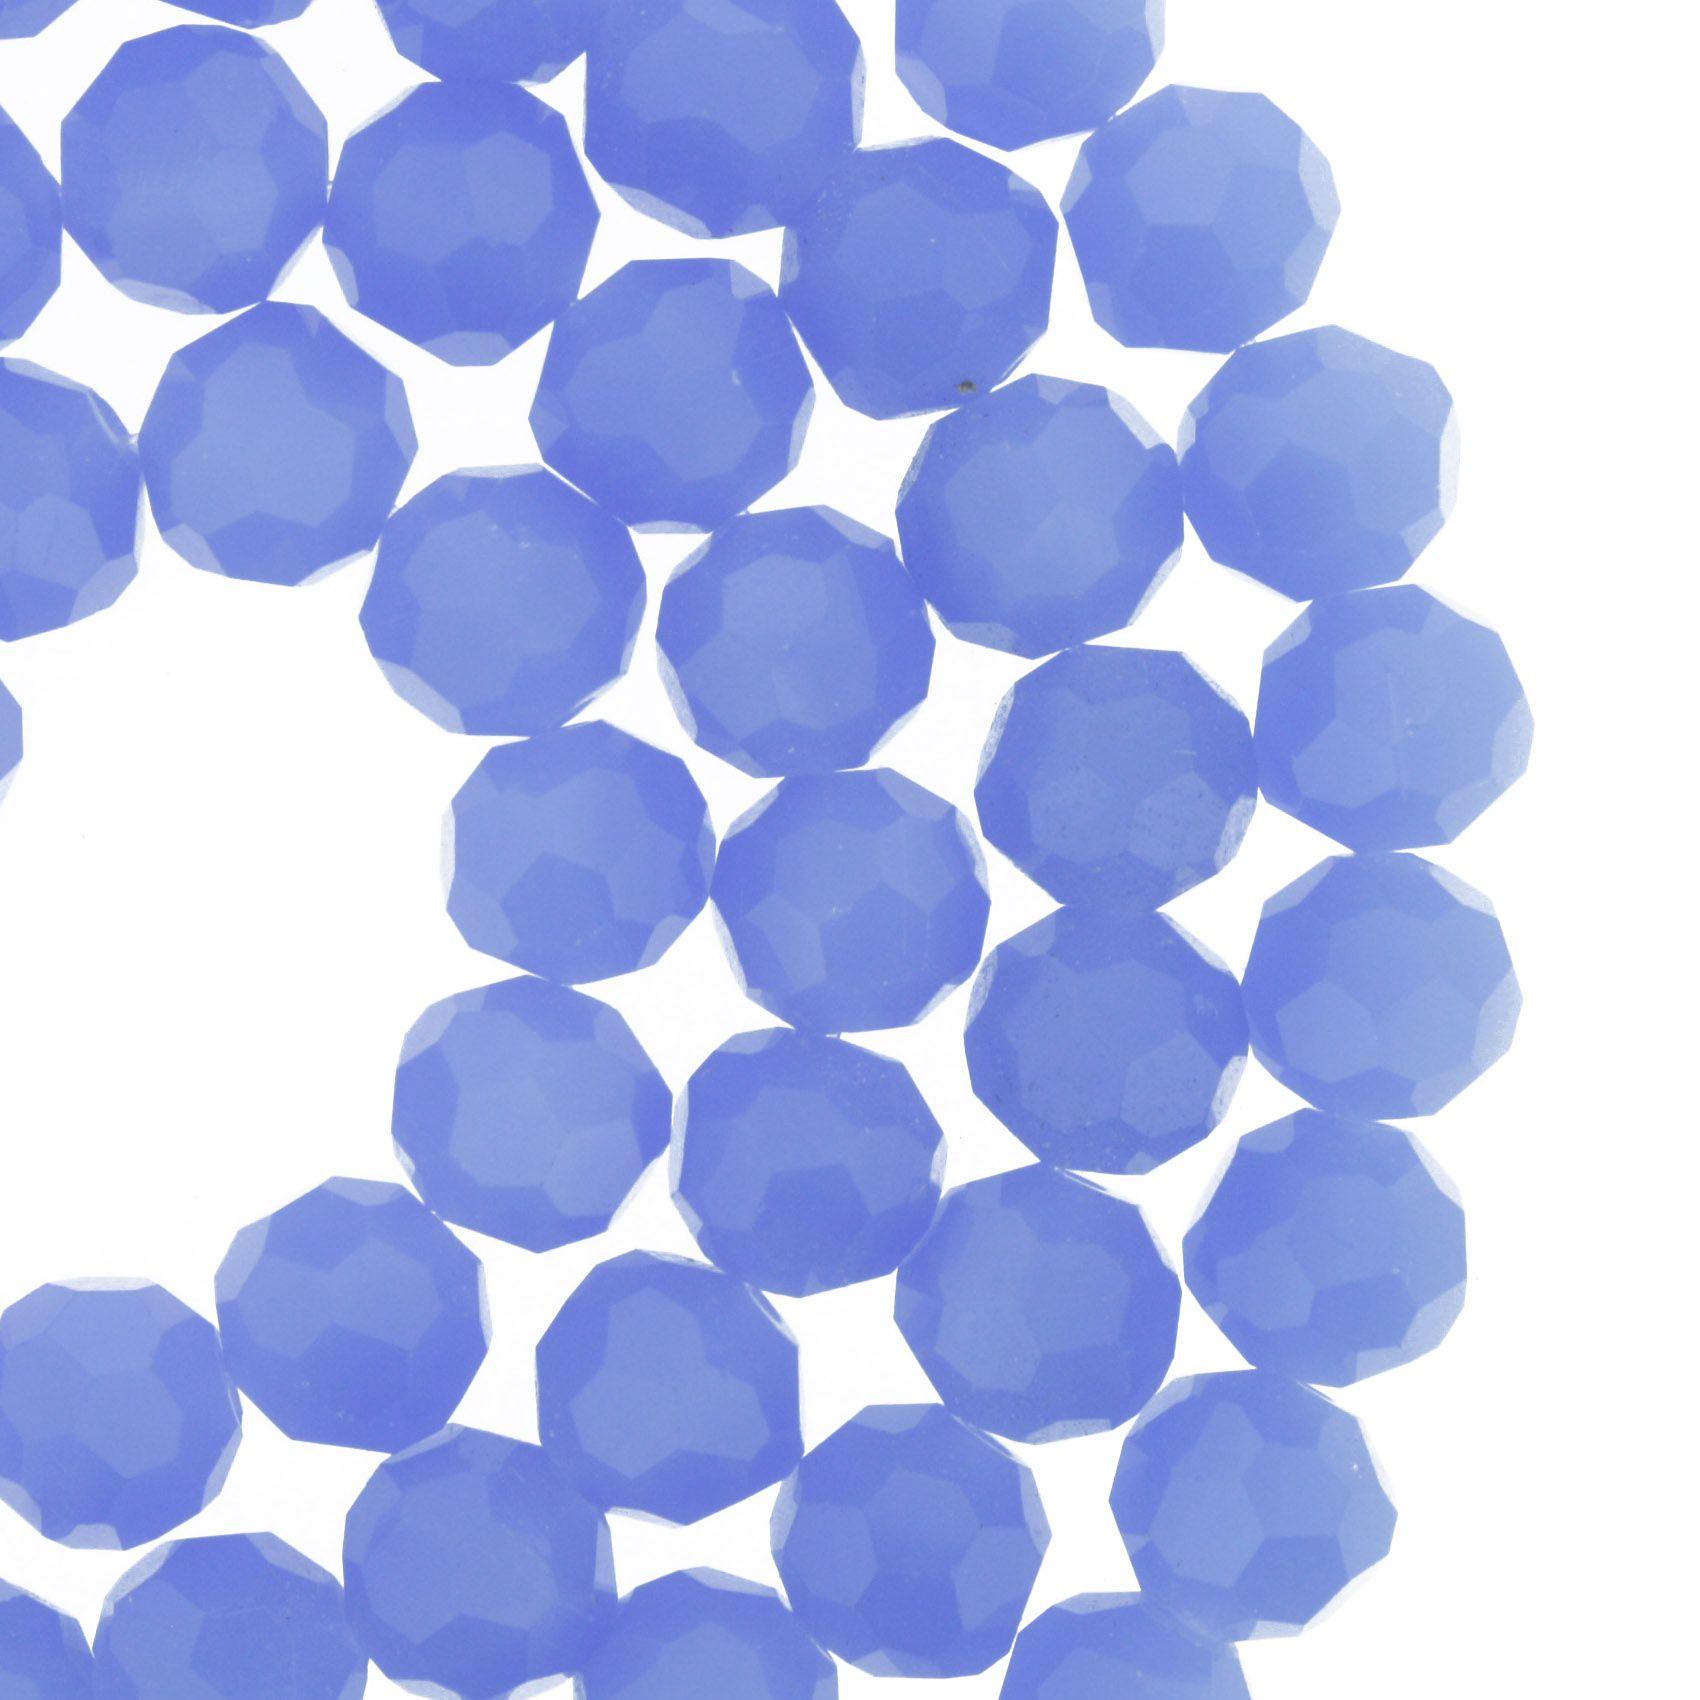 Fio de Cristal - Premium® - Lavanda - 8mm  - Stéphanie Bijoux® - Peças para Bijuterias e Artesanato